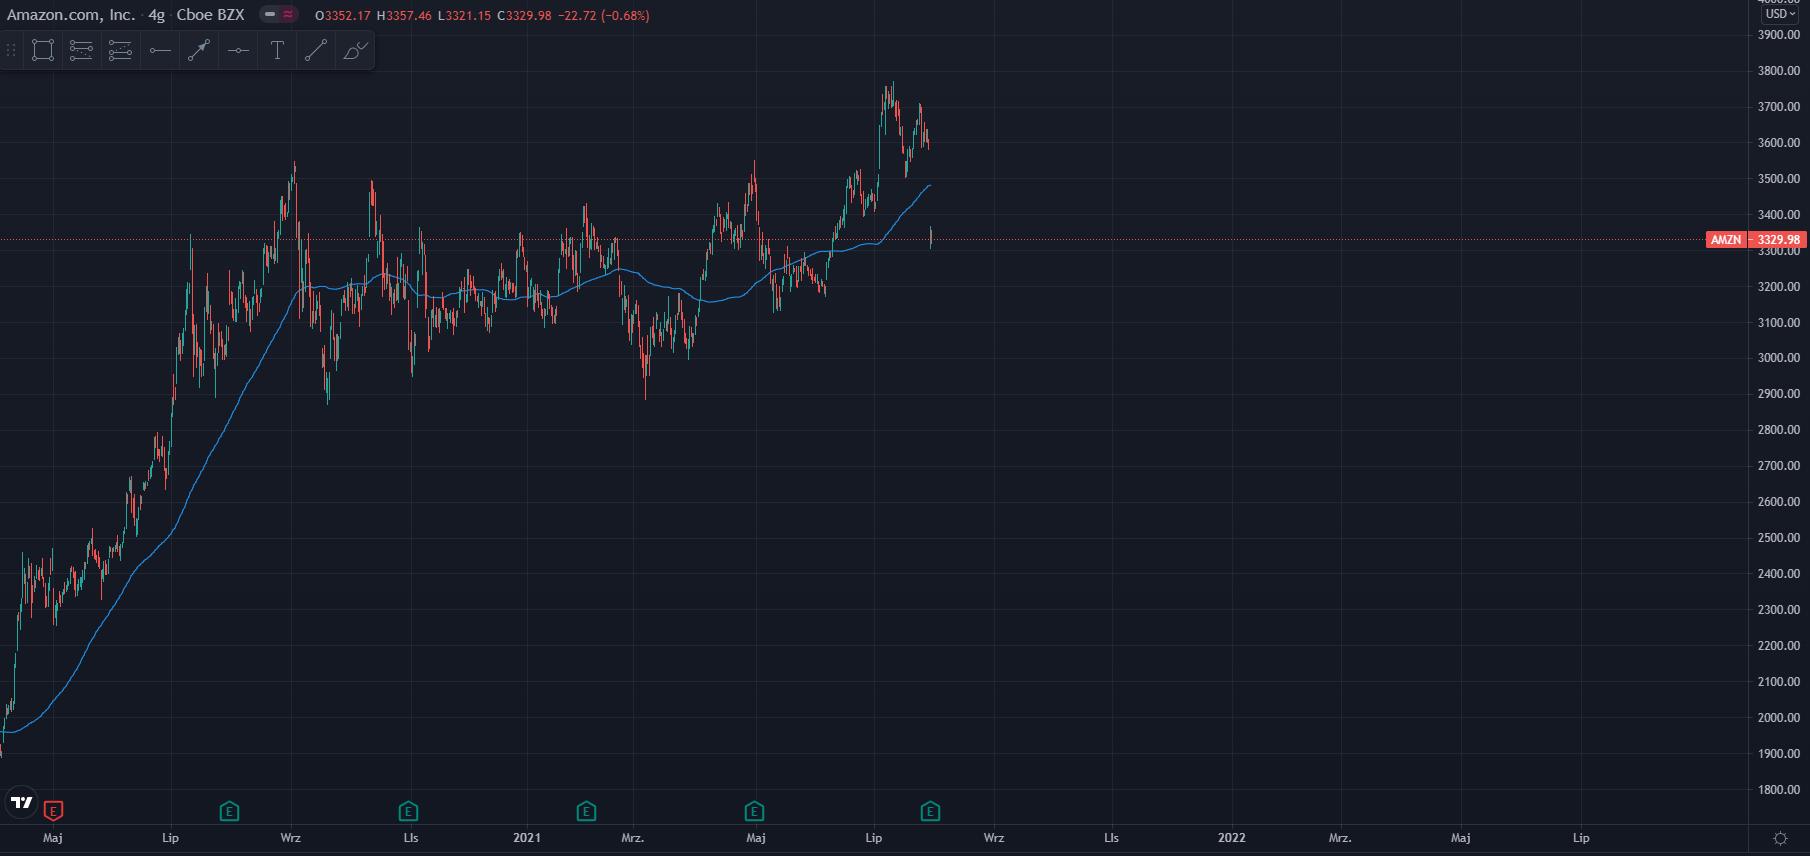 wykres Kurs akcji Amazon H4 02.08.2021